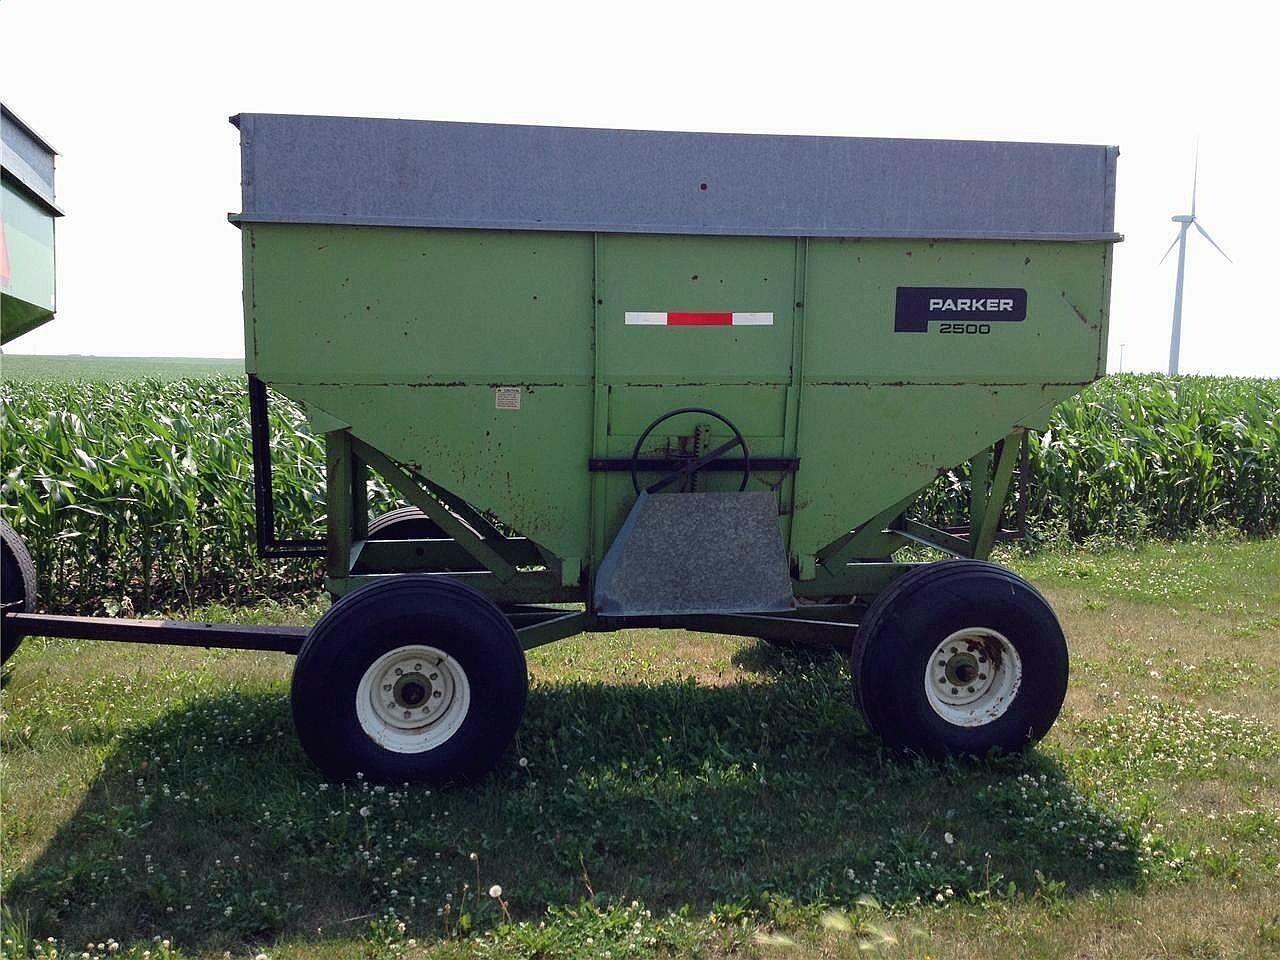 Parker 2500 Gravity Wagon